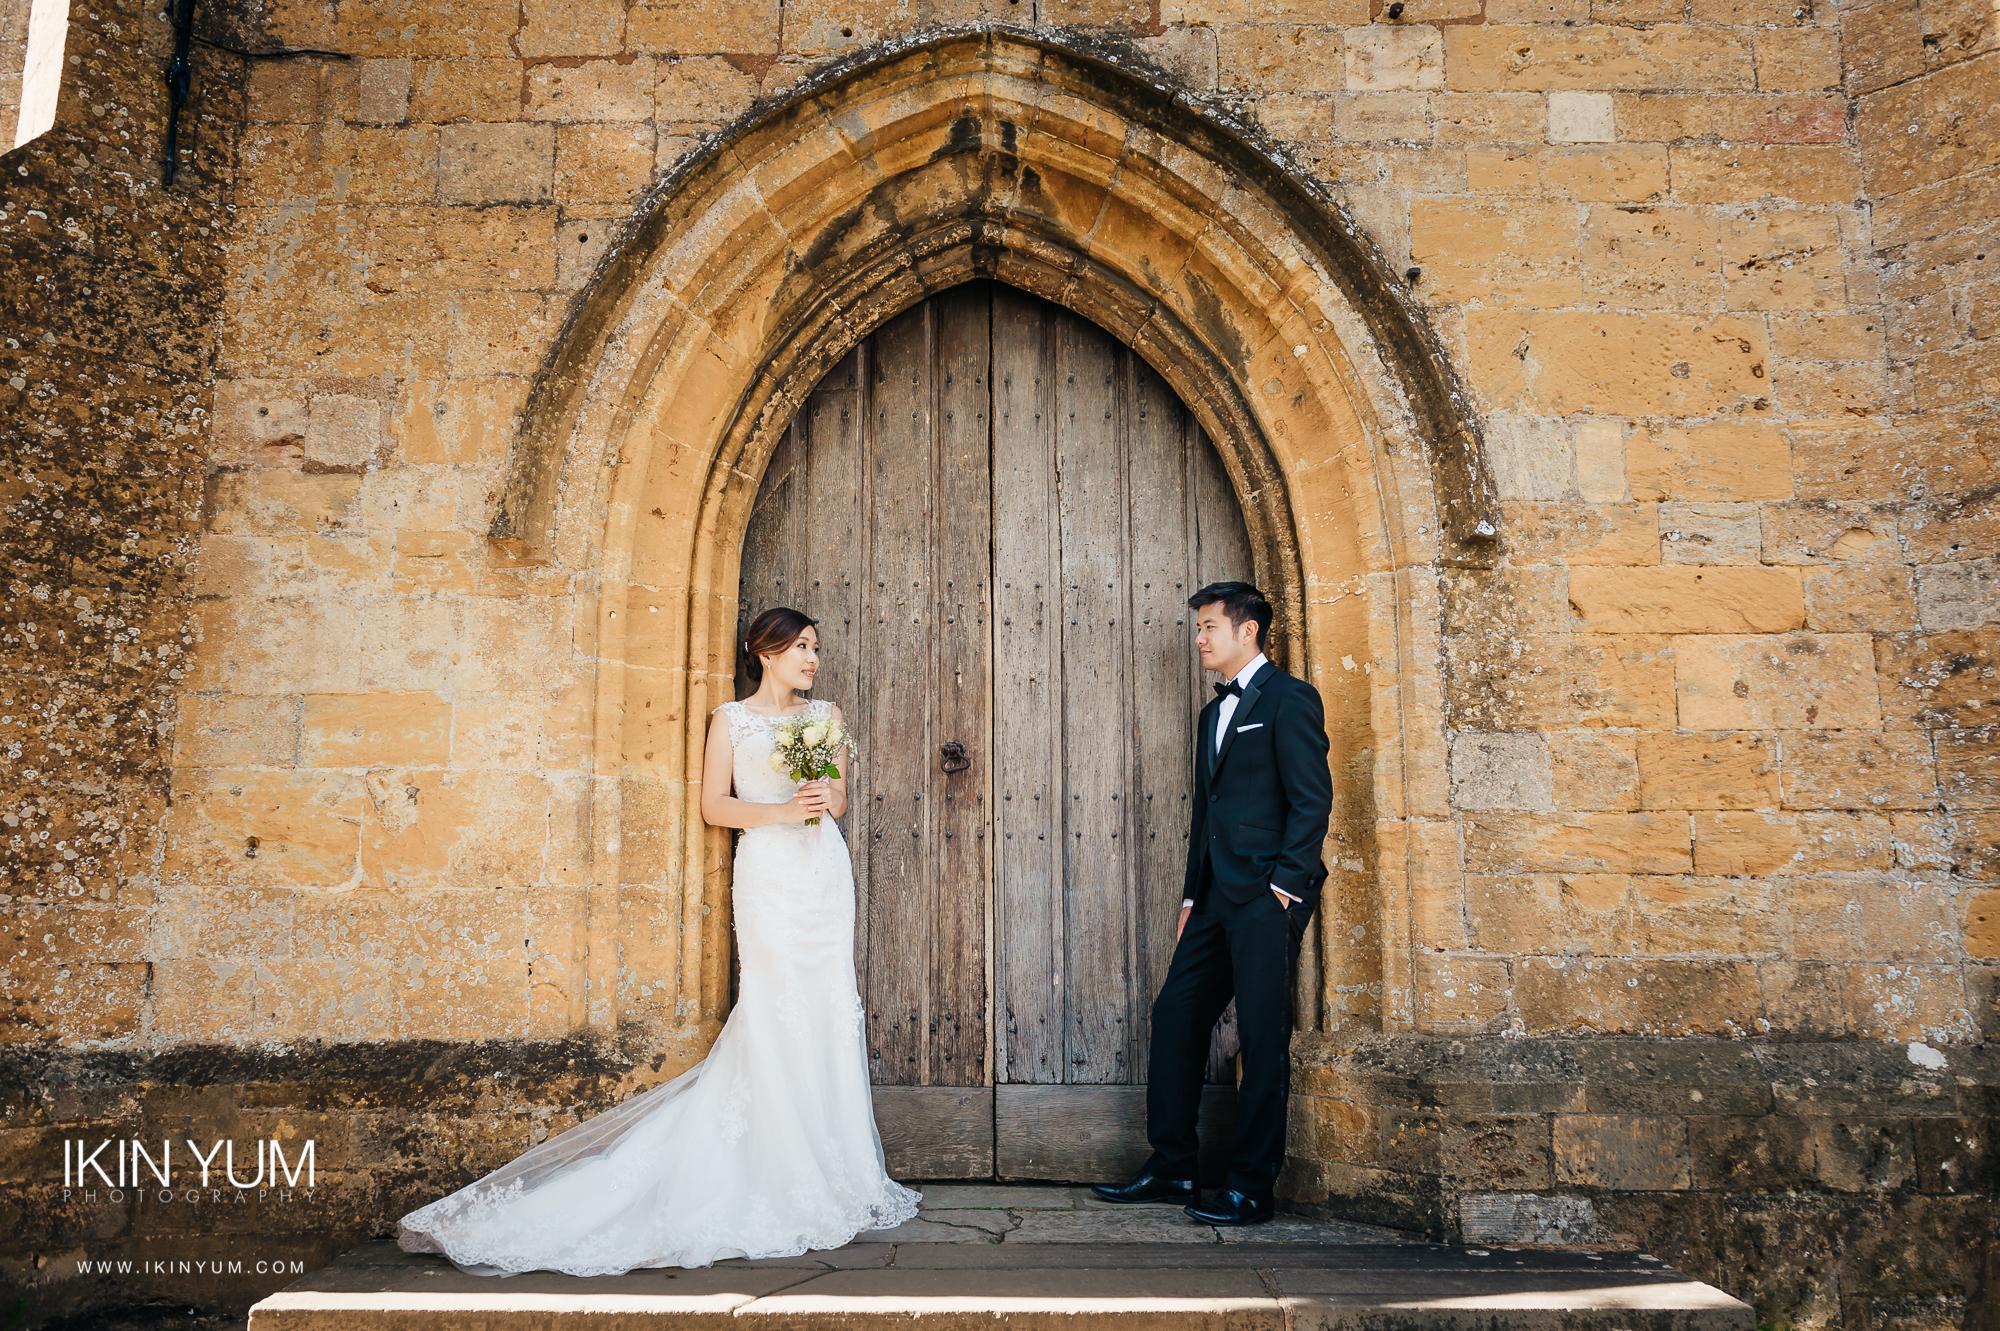 Carmen & Dennis Pre-Wedding Shoot - Ikin Yum Photography-064.jpg